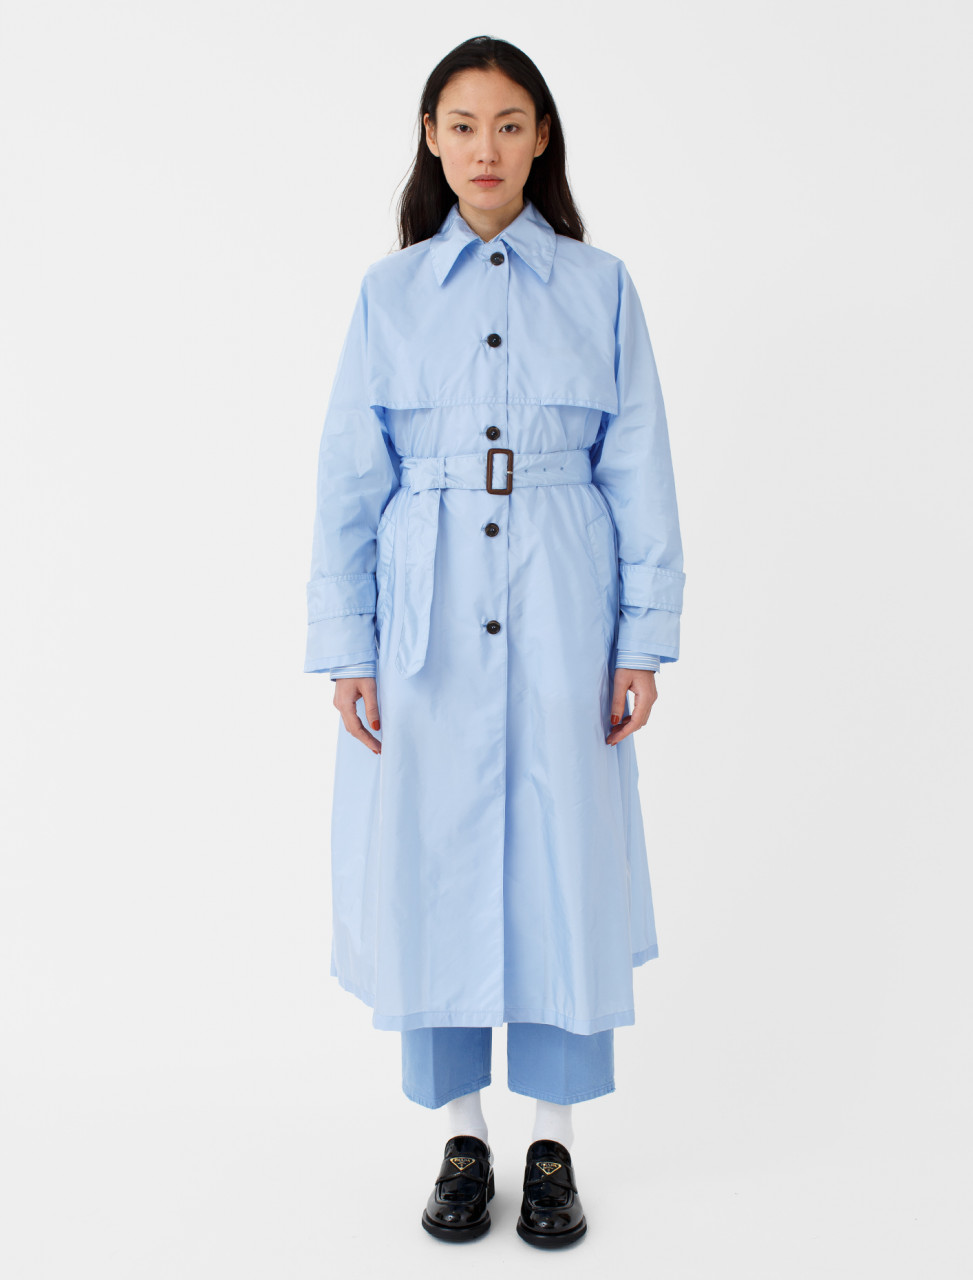 Belted Nylon Raincoat in Blue